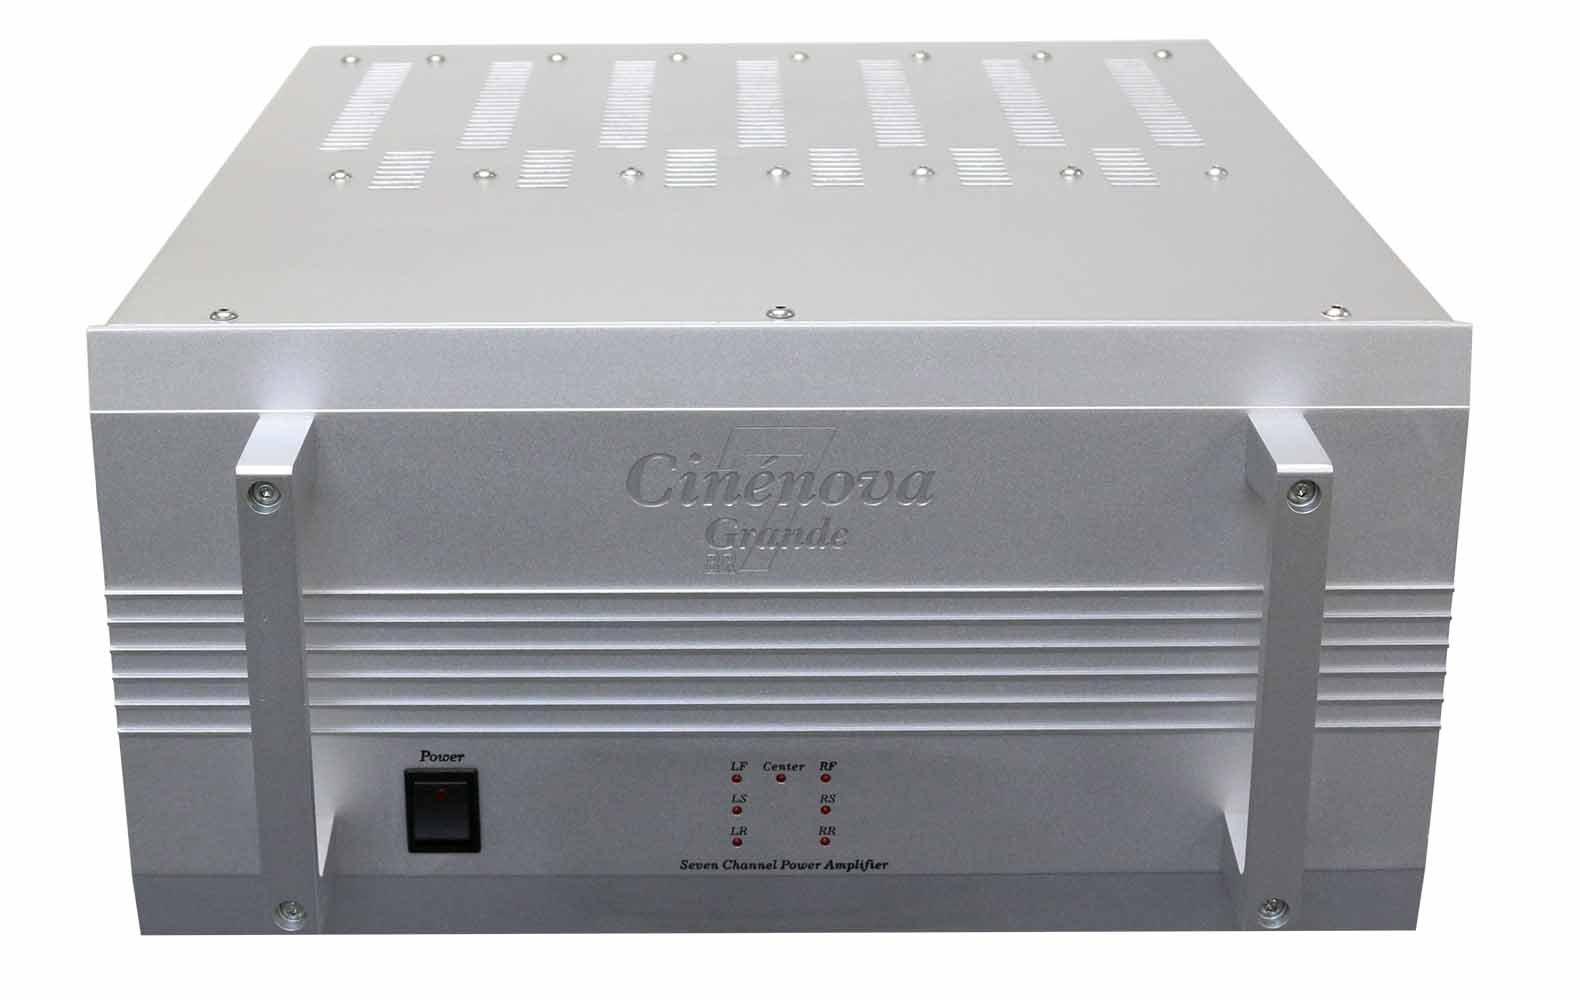 Earthquake Cinenova Grande 7BRS 7 x 300 RMS at 8 Ohms Bridgeable Audiophile 7.1 Home Theater Amplifier XLR Inputs 3 x 1400 RMS + 1 x 610 RMS at 4 Ohms SILVER by Earthquake Sound